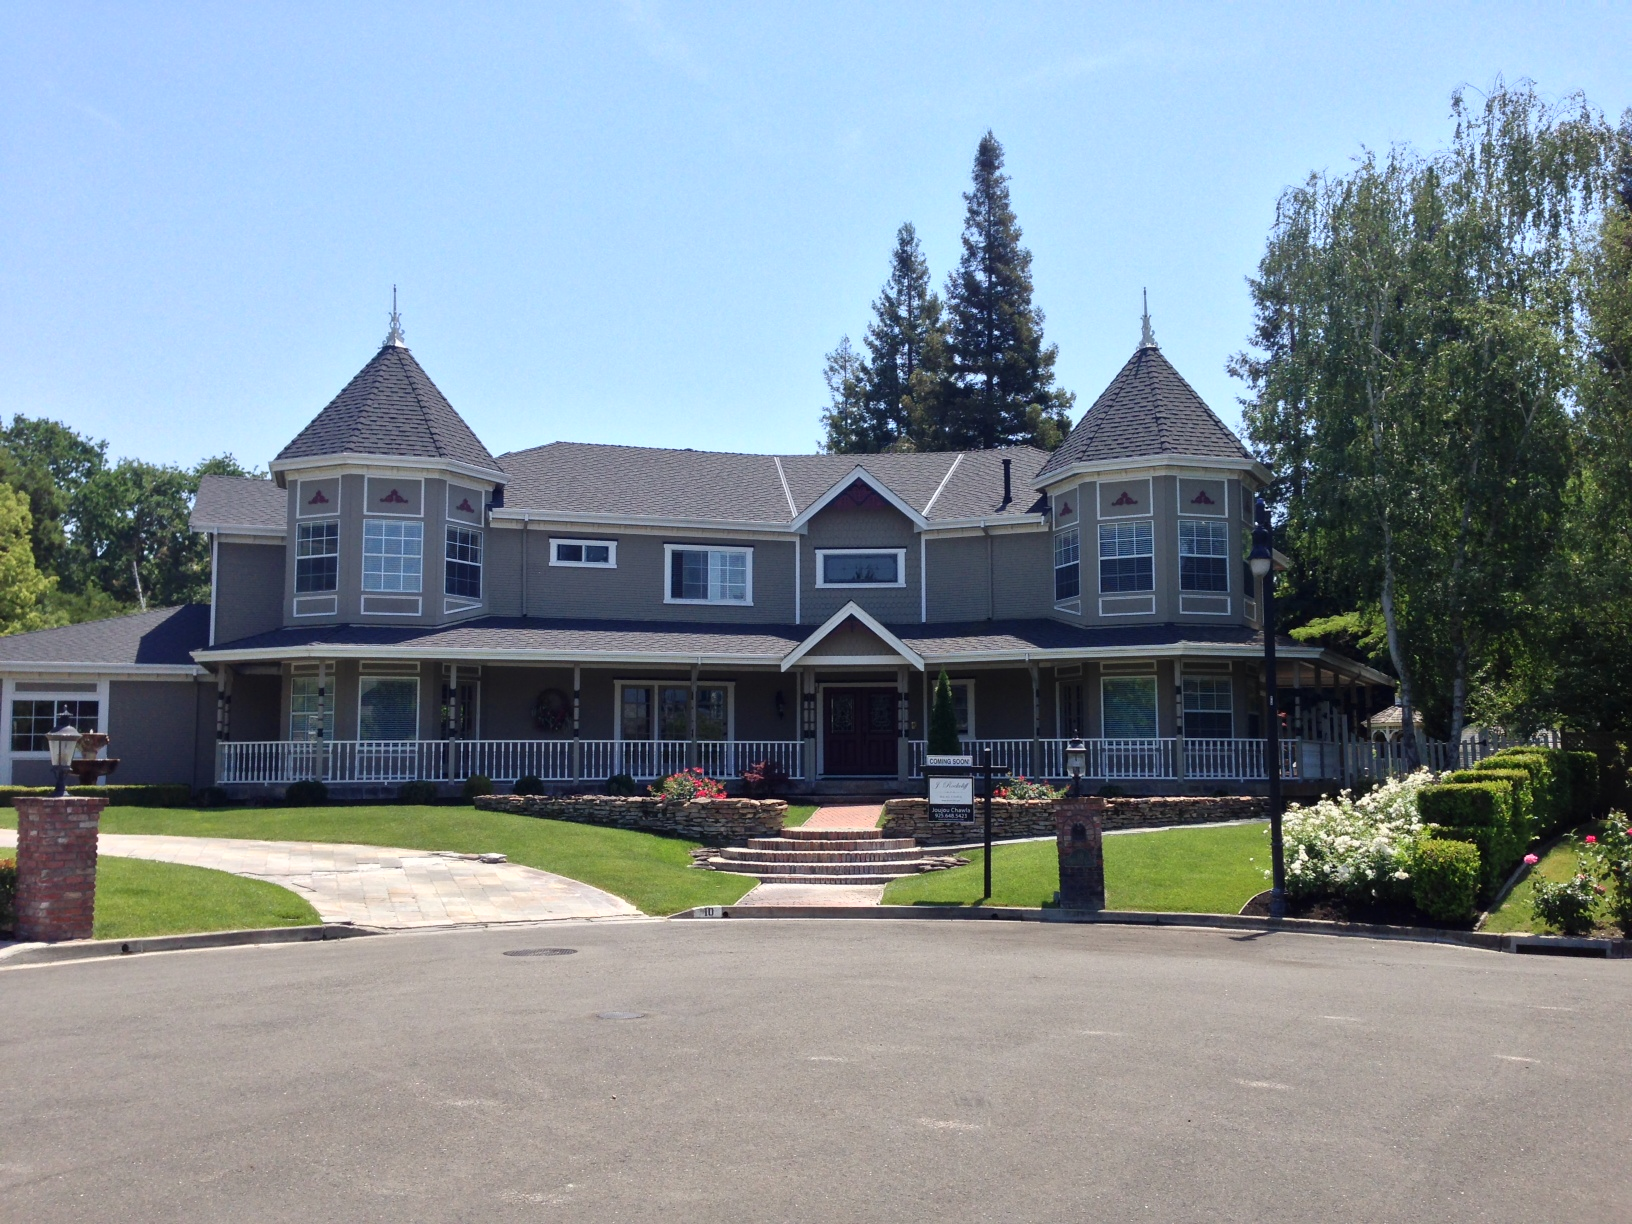 OPEN HOUSE SUNDAY FOR 5 BEDROOM IN DANVILLE CA